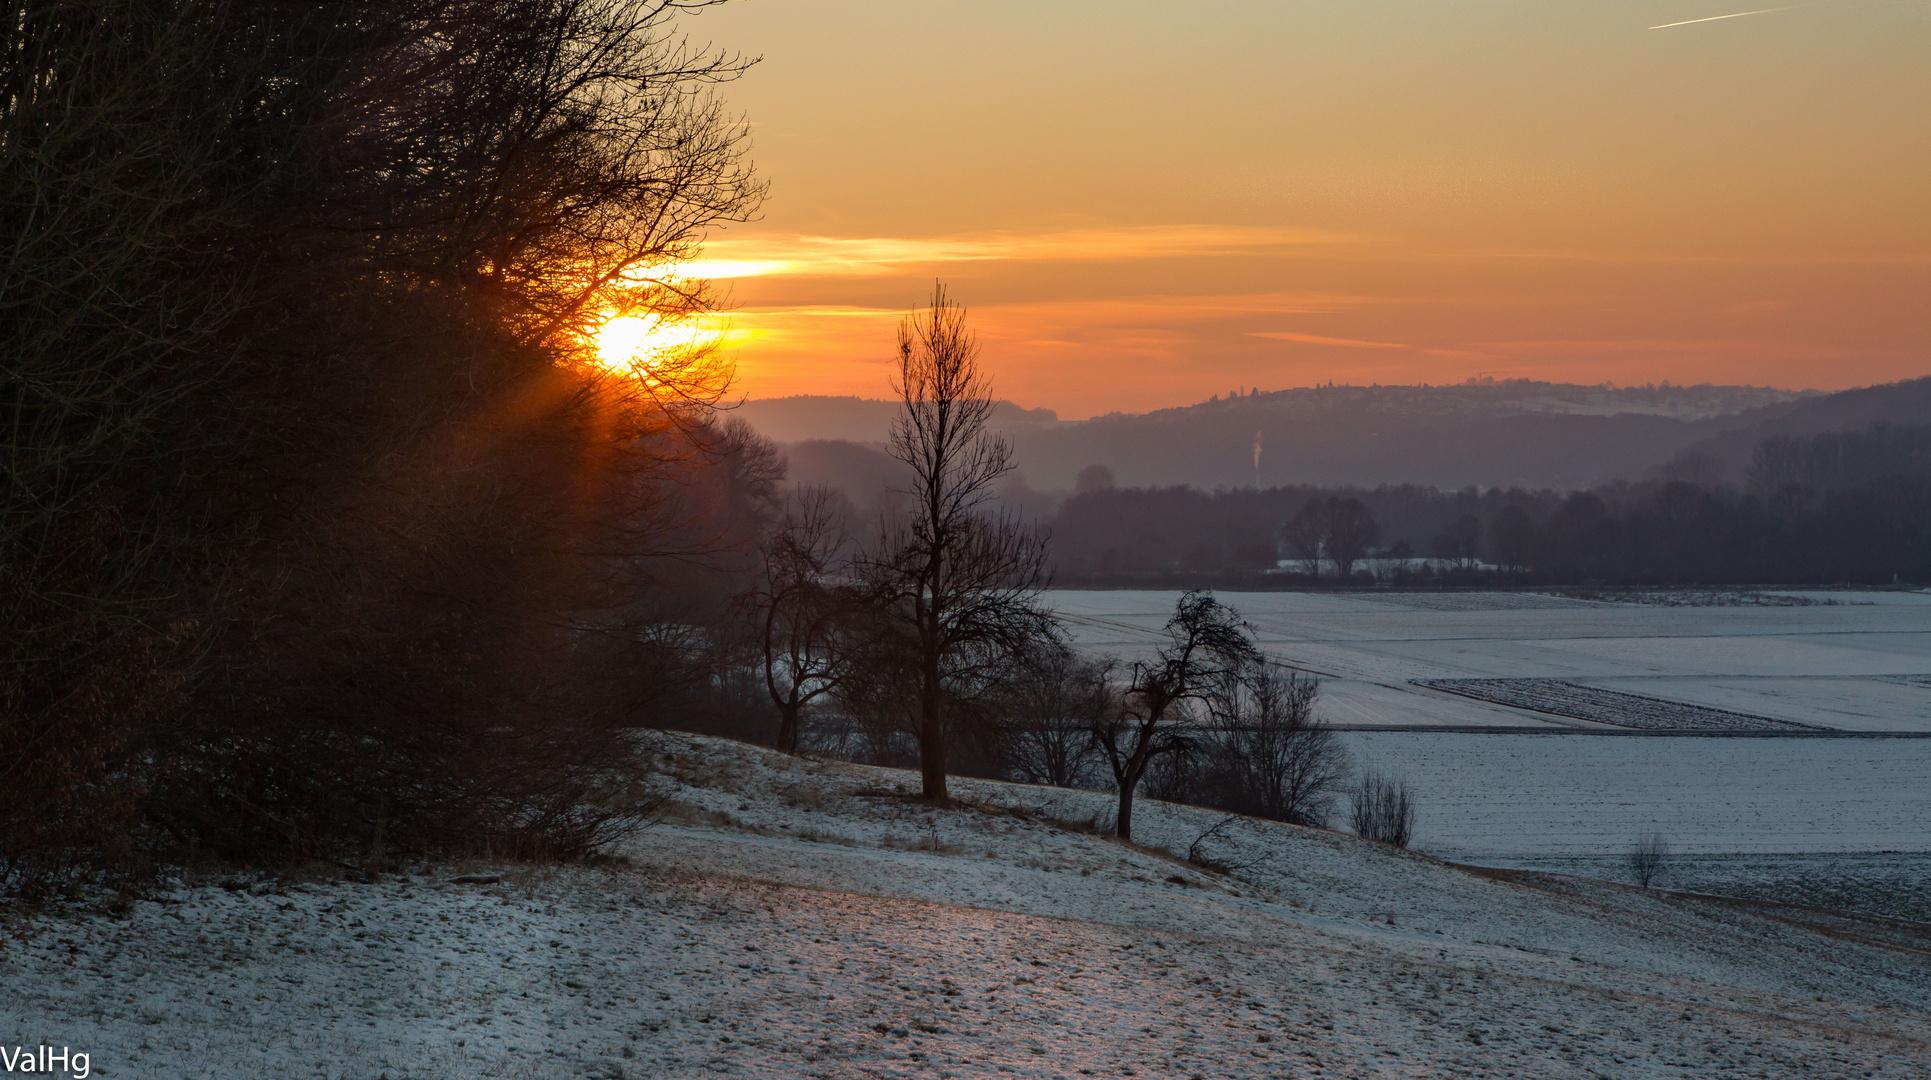 Sonnenuntergang in Neckartailfingen